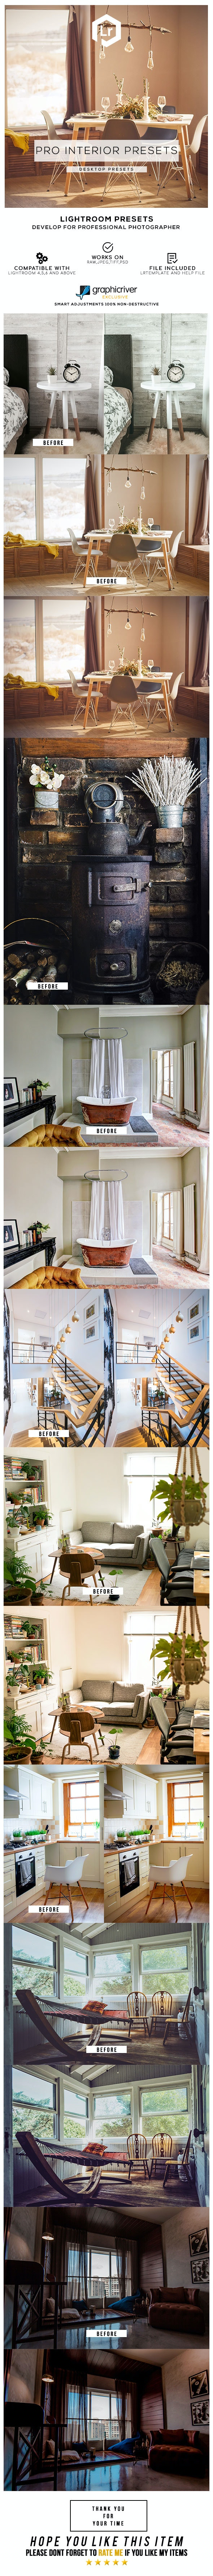 28 Pro Interior Presets - Lightroom Presets Add-ons